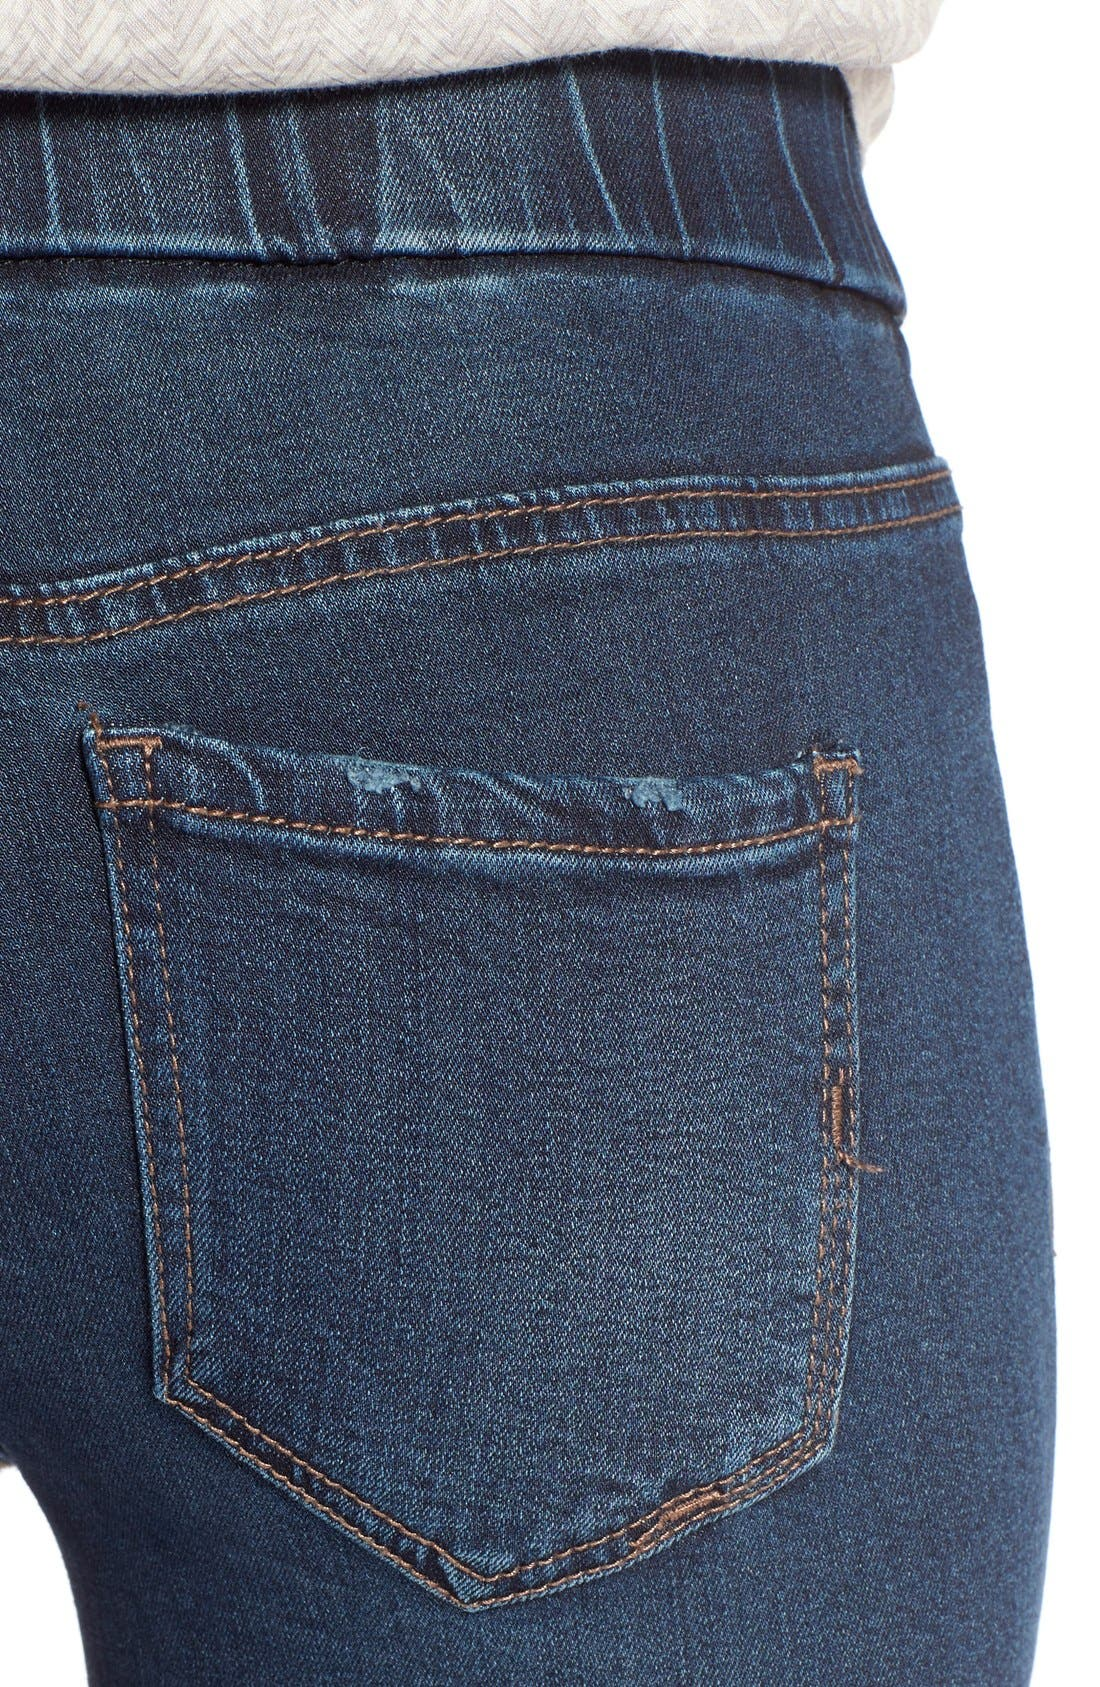 Sienna Pull-On Knit Denim Leggings,                             Alternate thumbnail 4, color,                             Petrol Wash